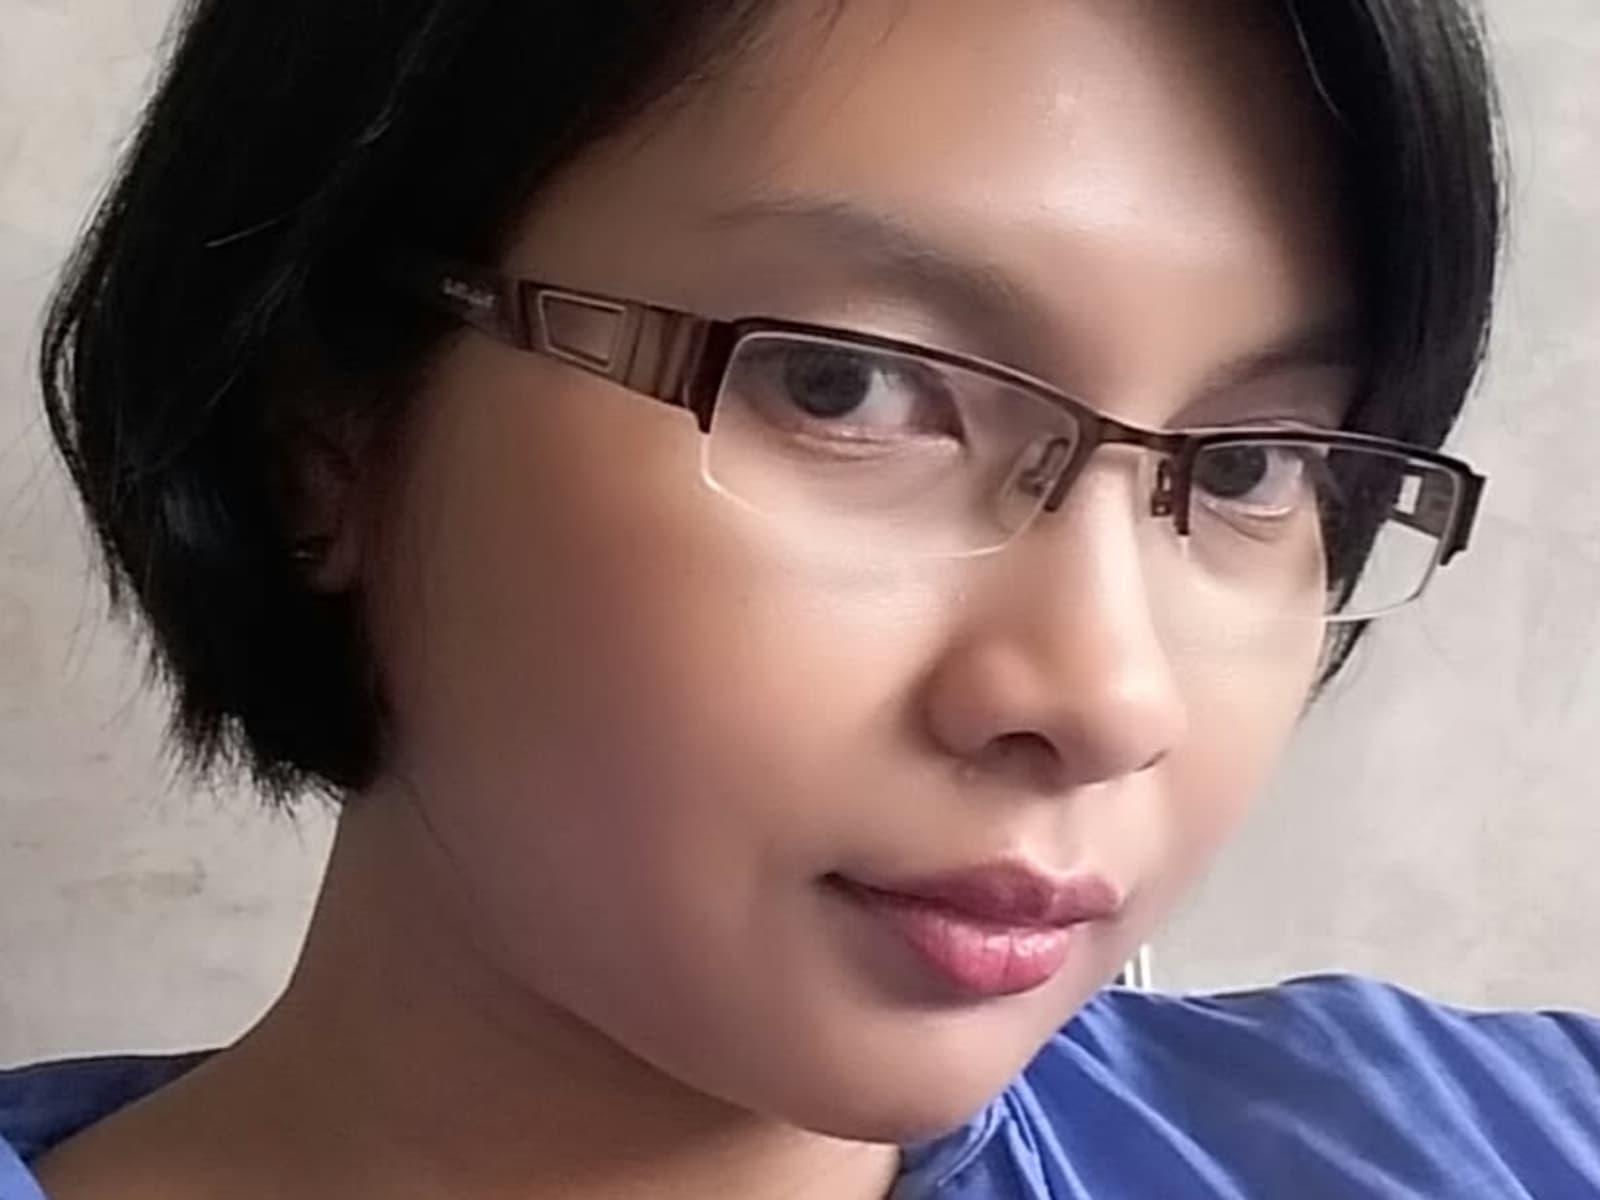 Patcharee from Bangkok, Thailand